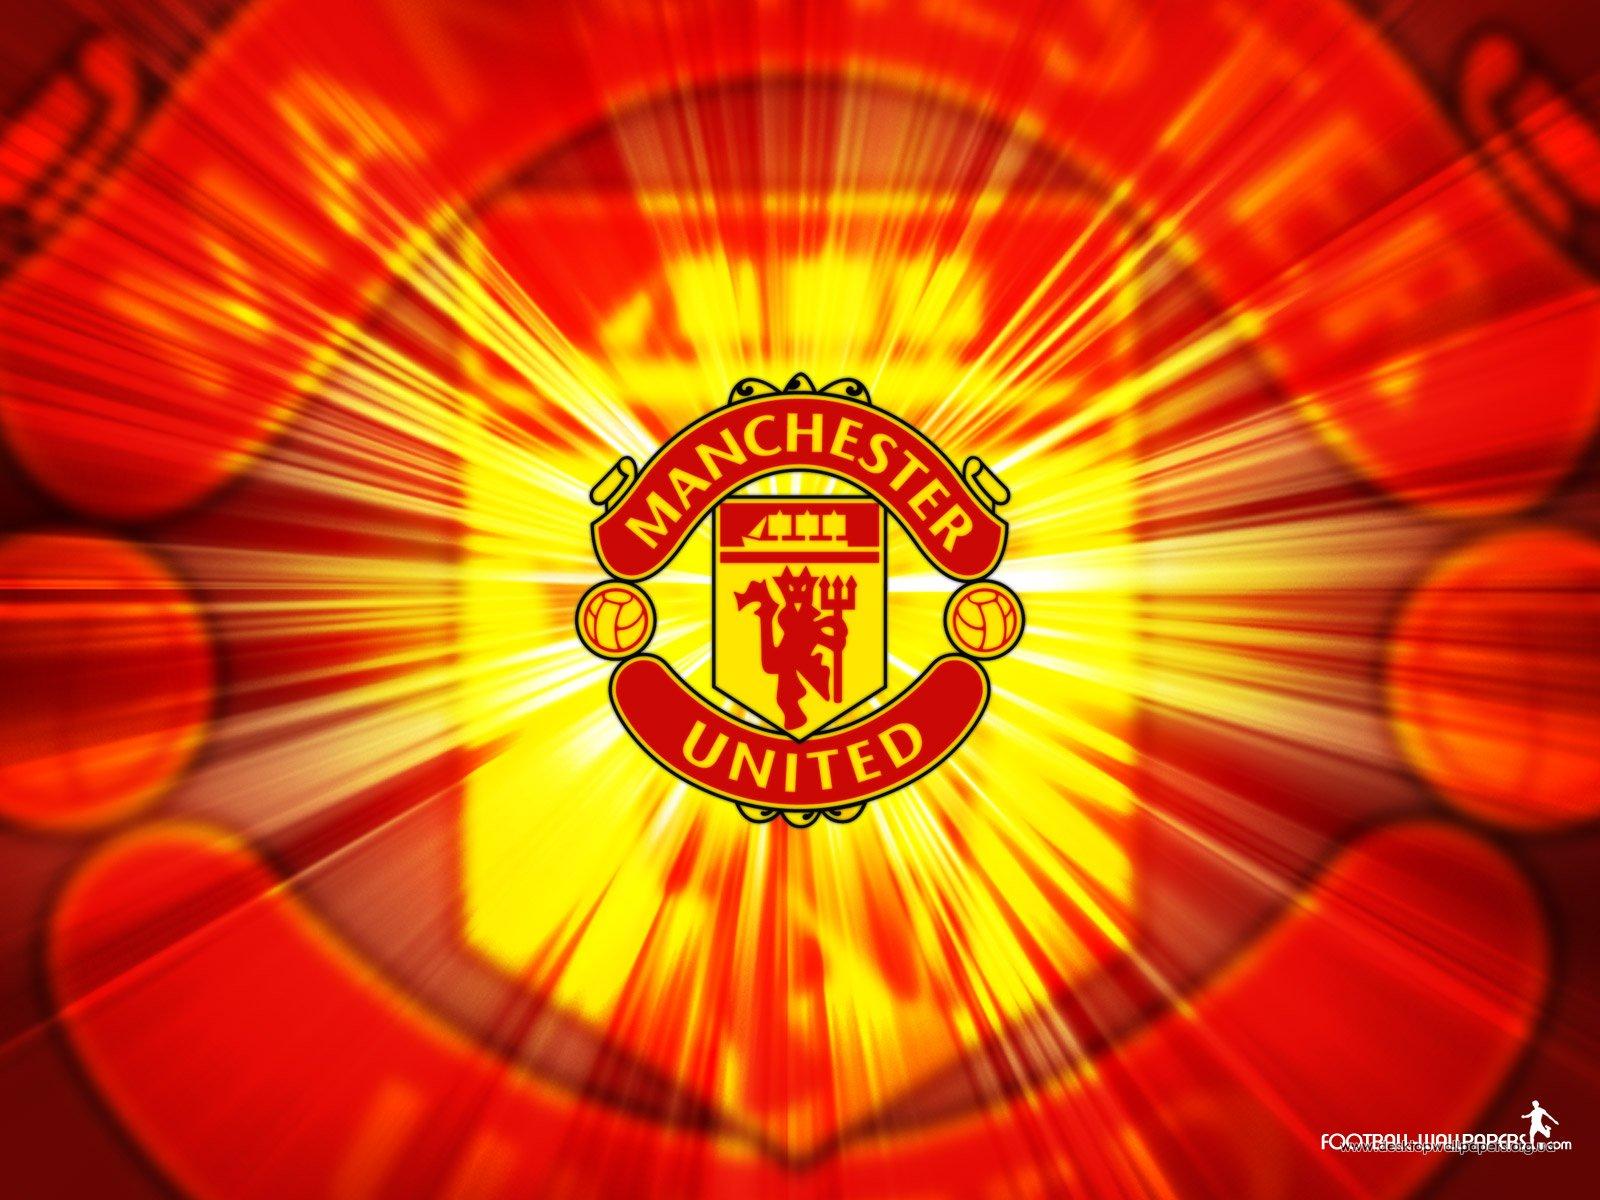 Manchester United Logo HD Wallpaper For Desktop